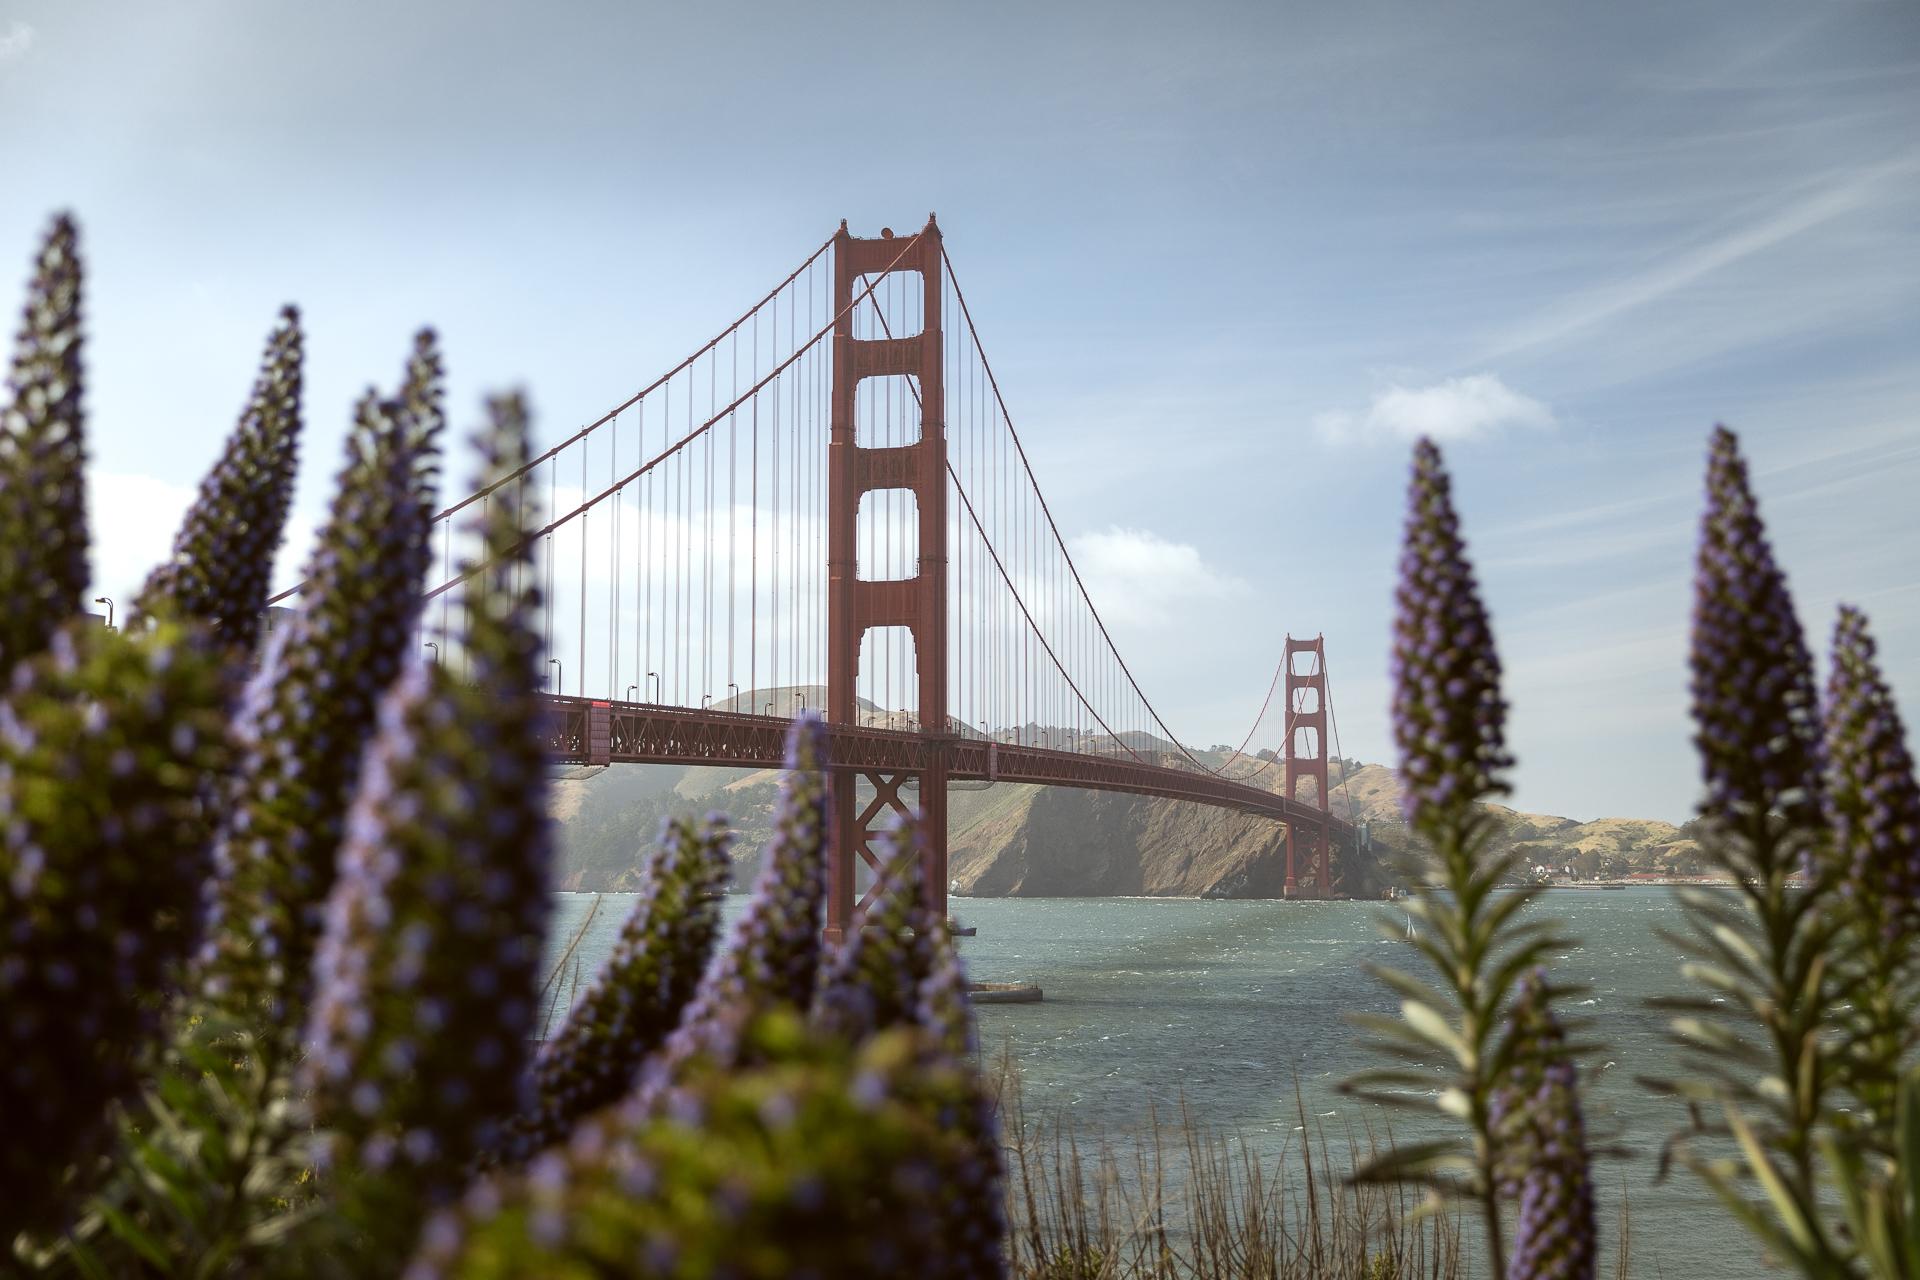 Golden Gate Bridge in San Francisco Frühjahr